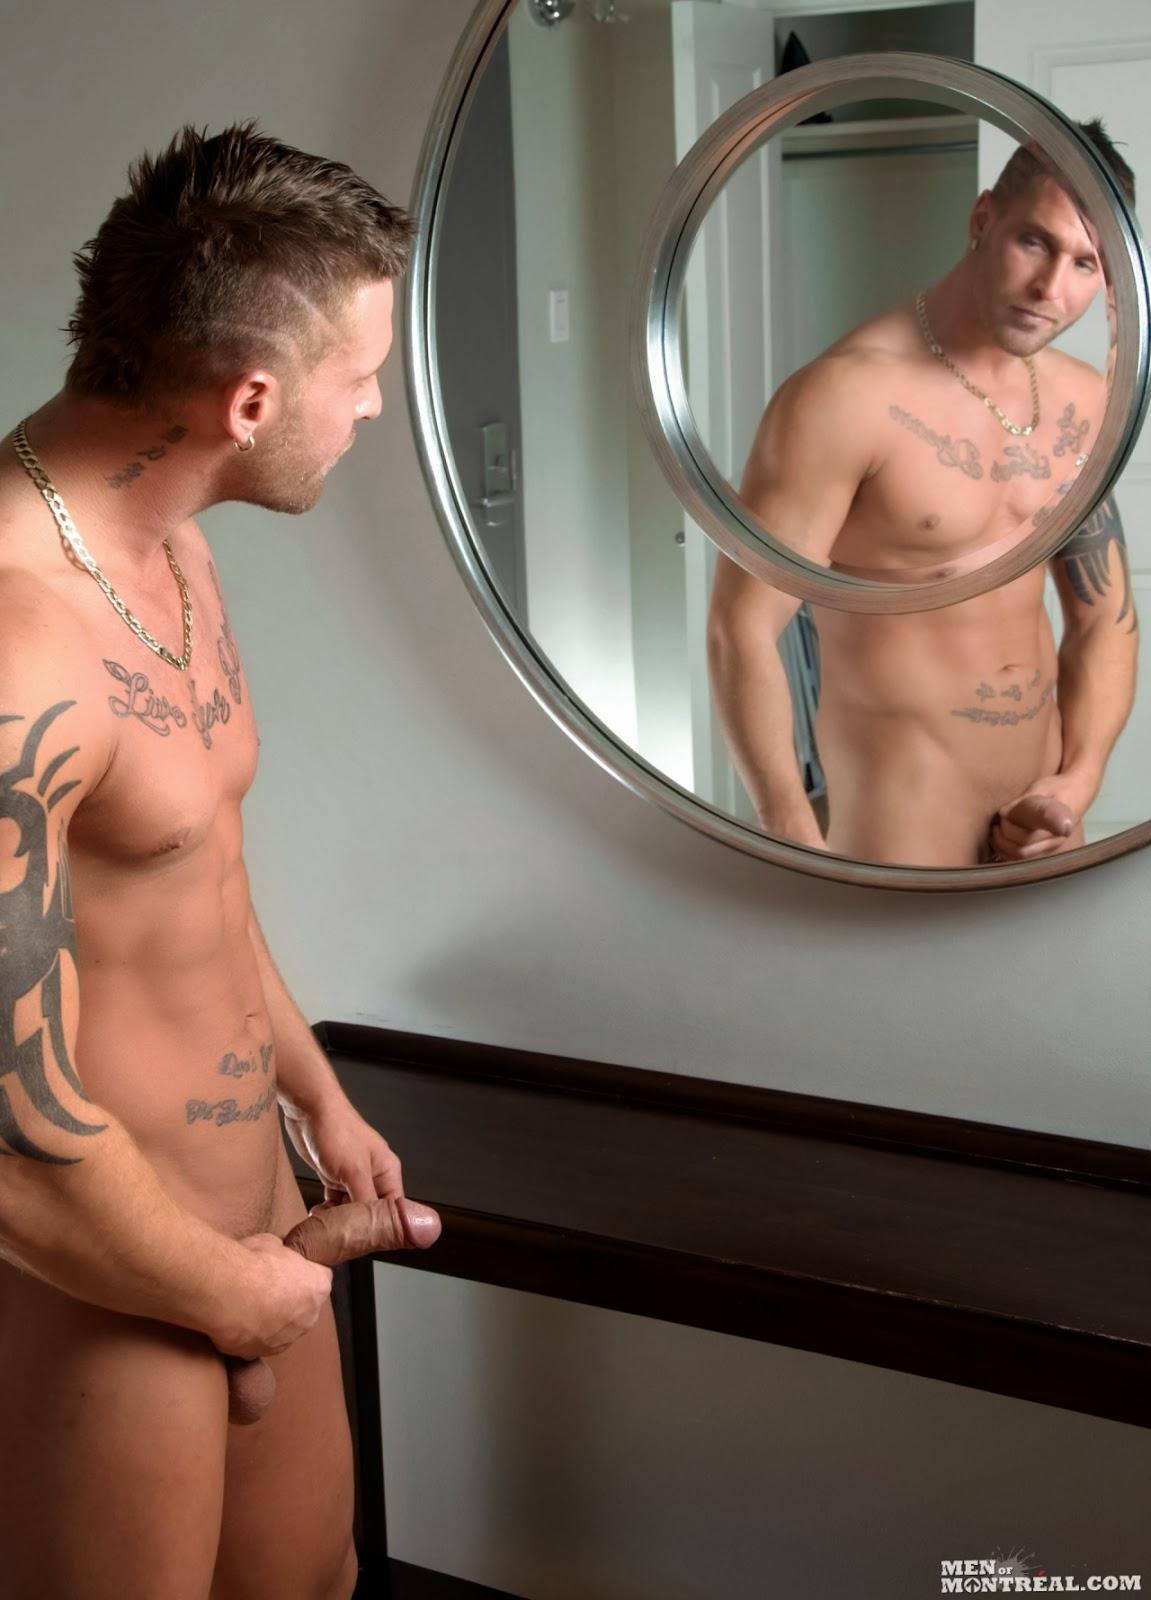 prince Gay kevin porn star